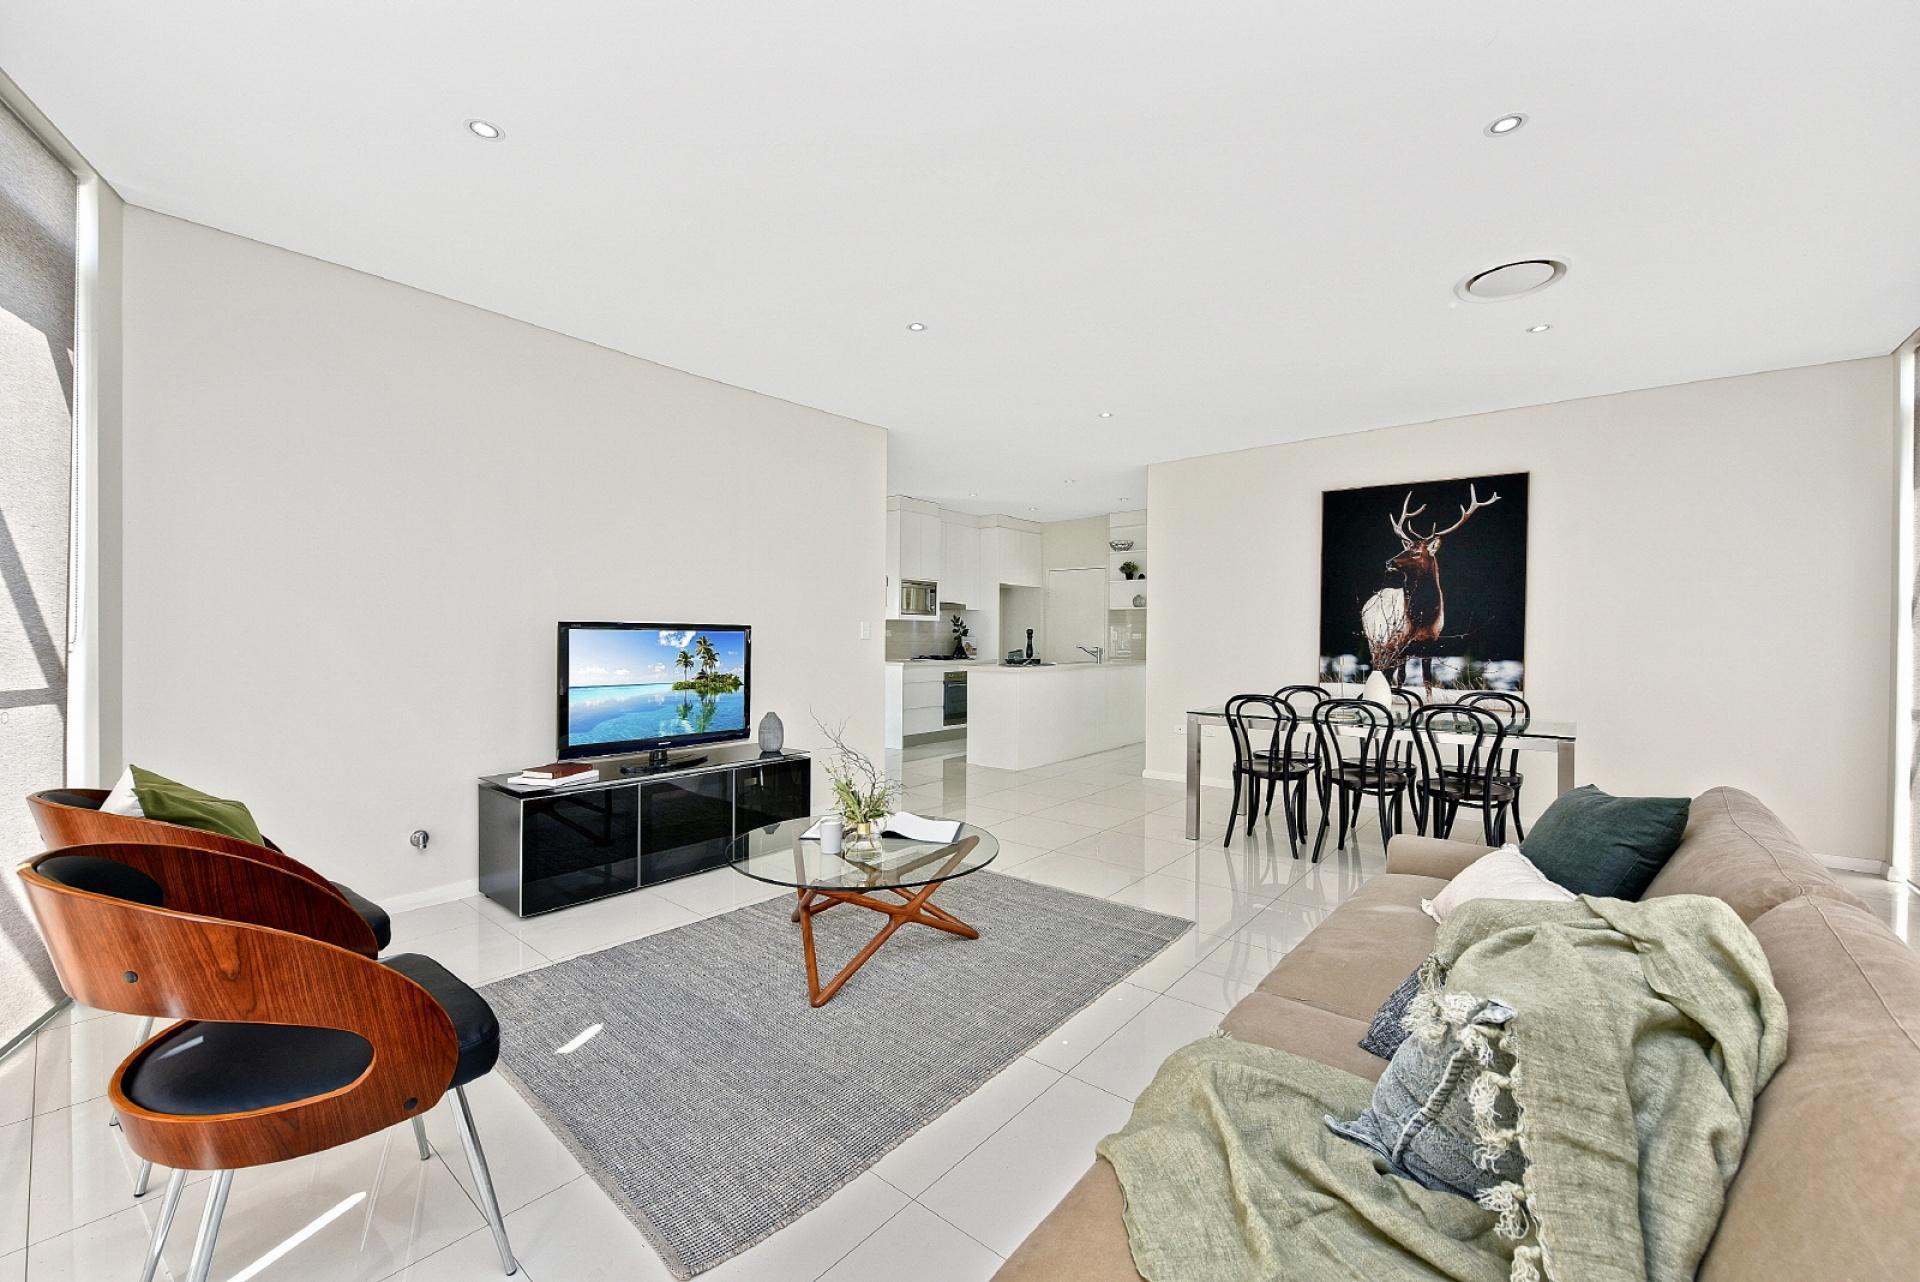 3 Bedrooms, Apartment, Leased, Harrington Avenue, 2 Bathrooms, Listing ID 1252, Castle Hill, NSW, Australia,